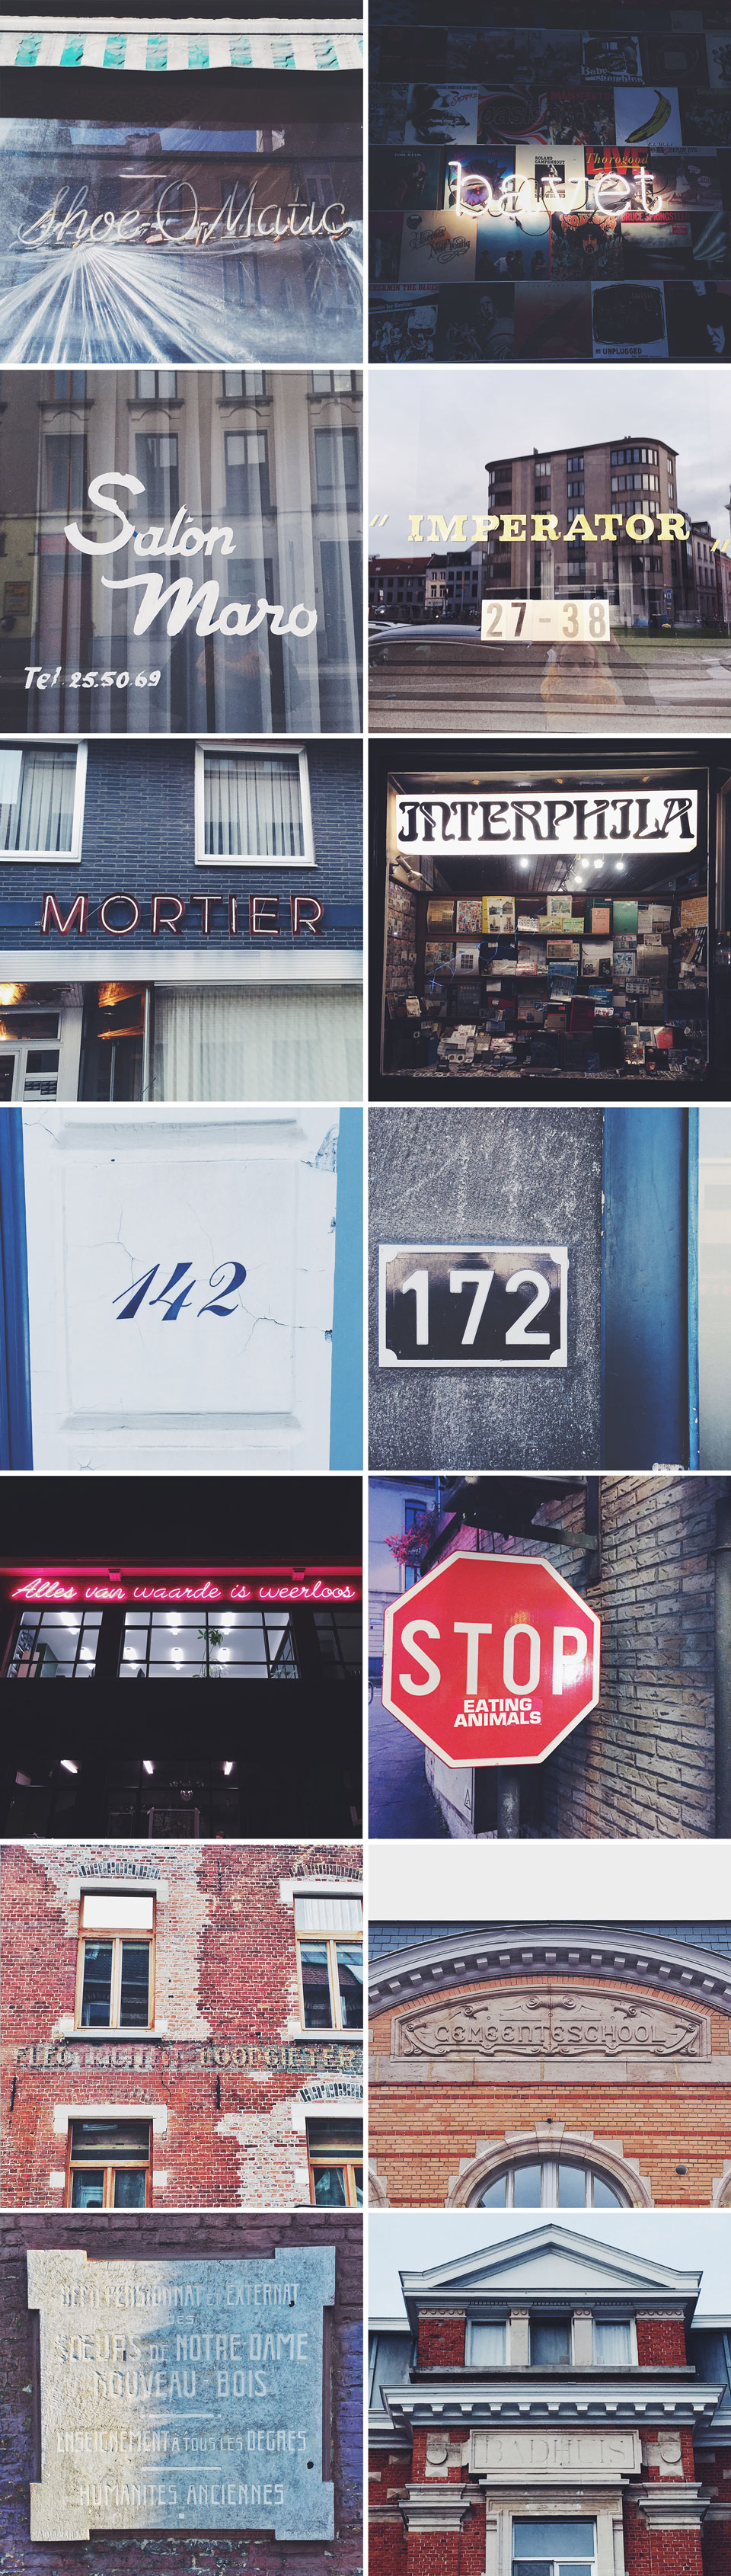 streettypography-verzameling2